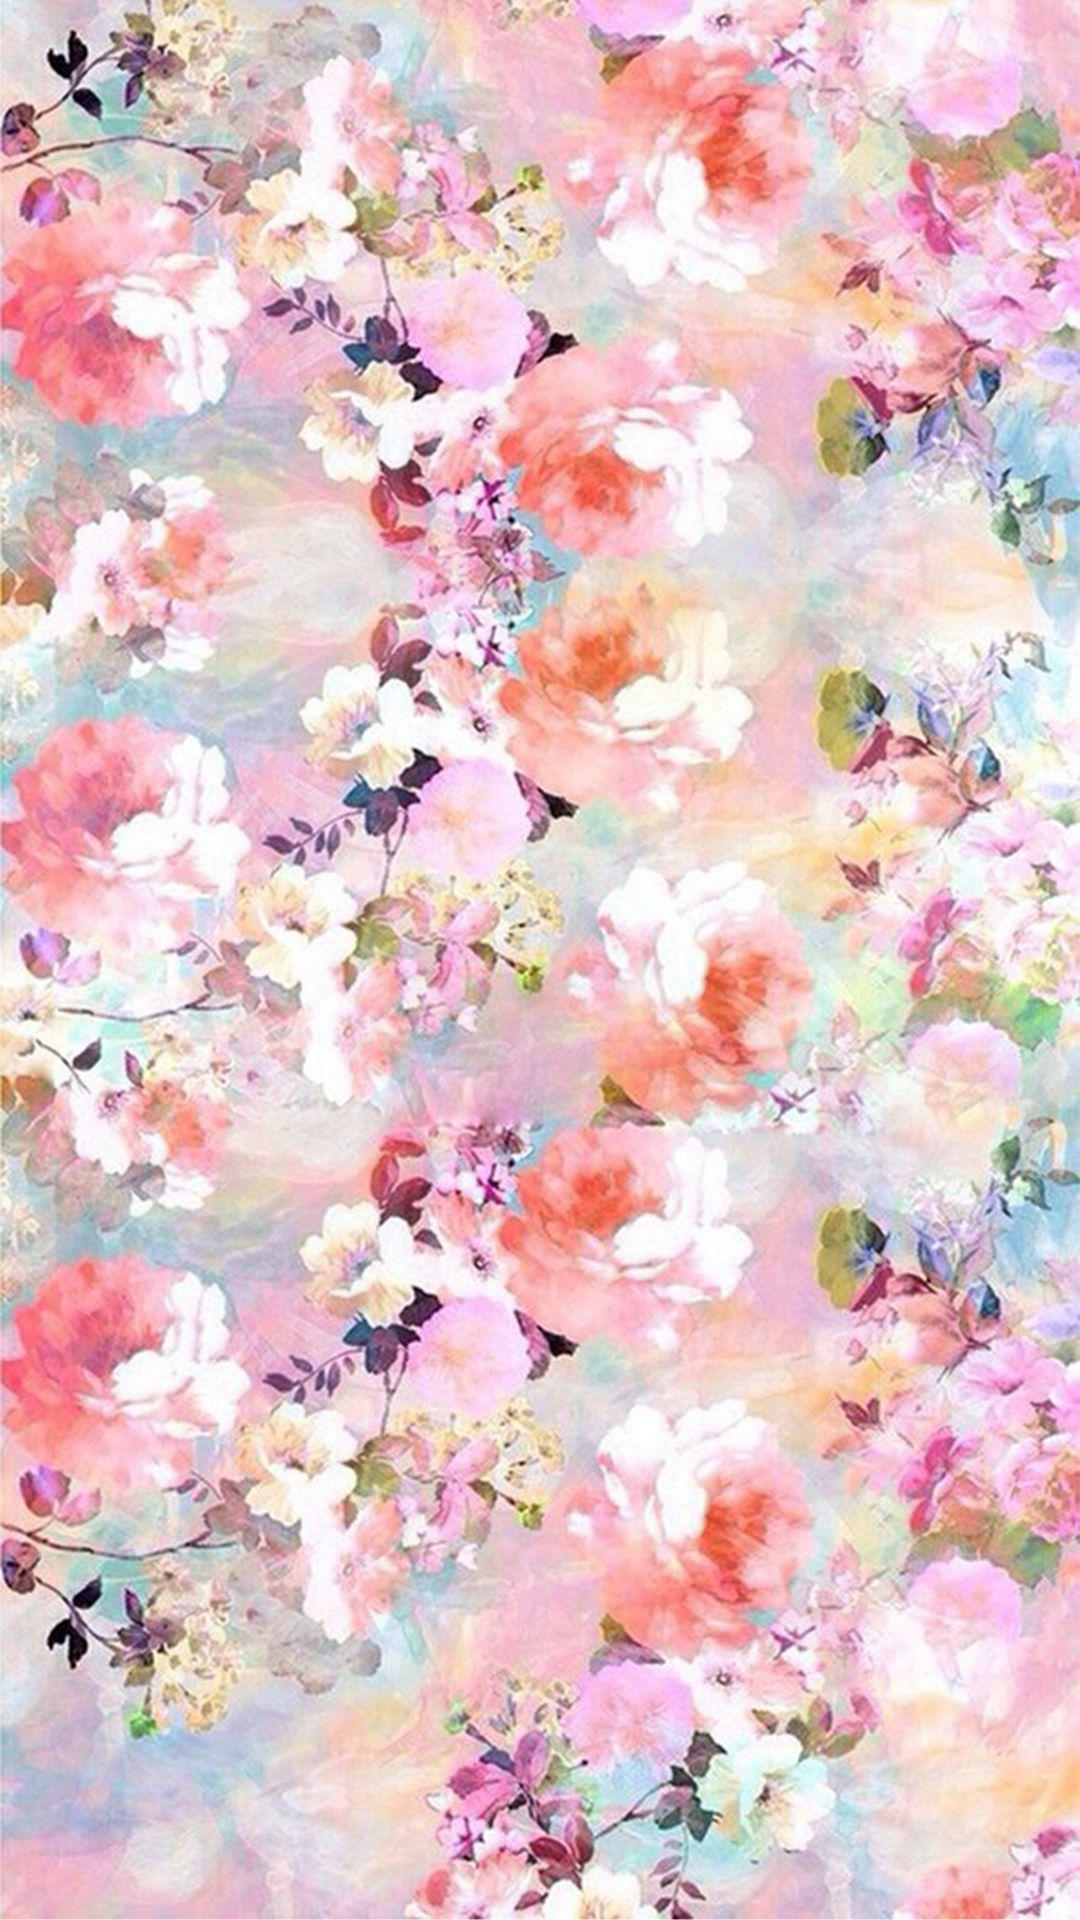 Watercolor Flowers Painting Iphone 8 Wallpaper Floral Iphone Background Painting Wallpaper Watercolor Flowers Paintings